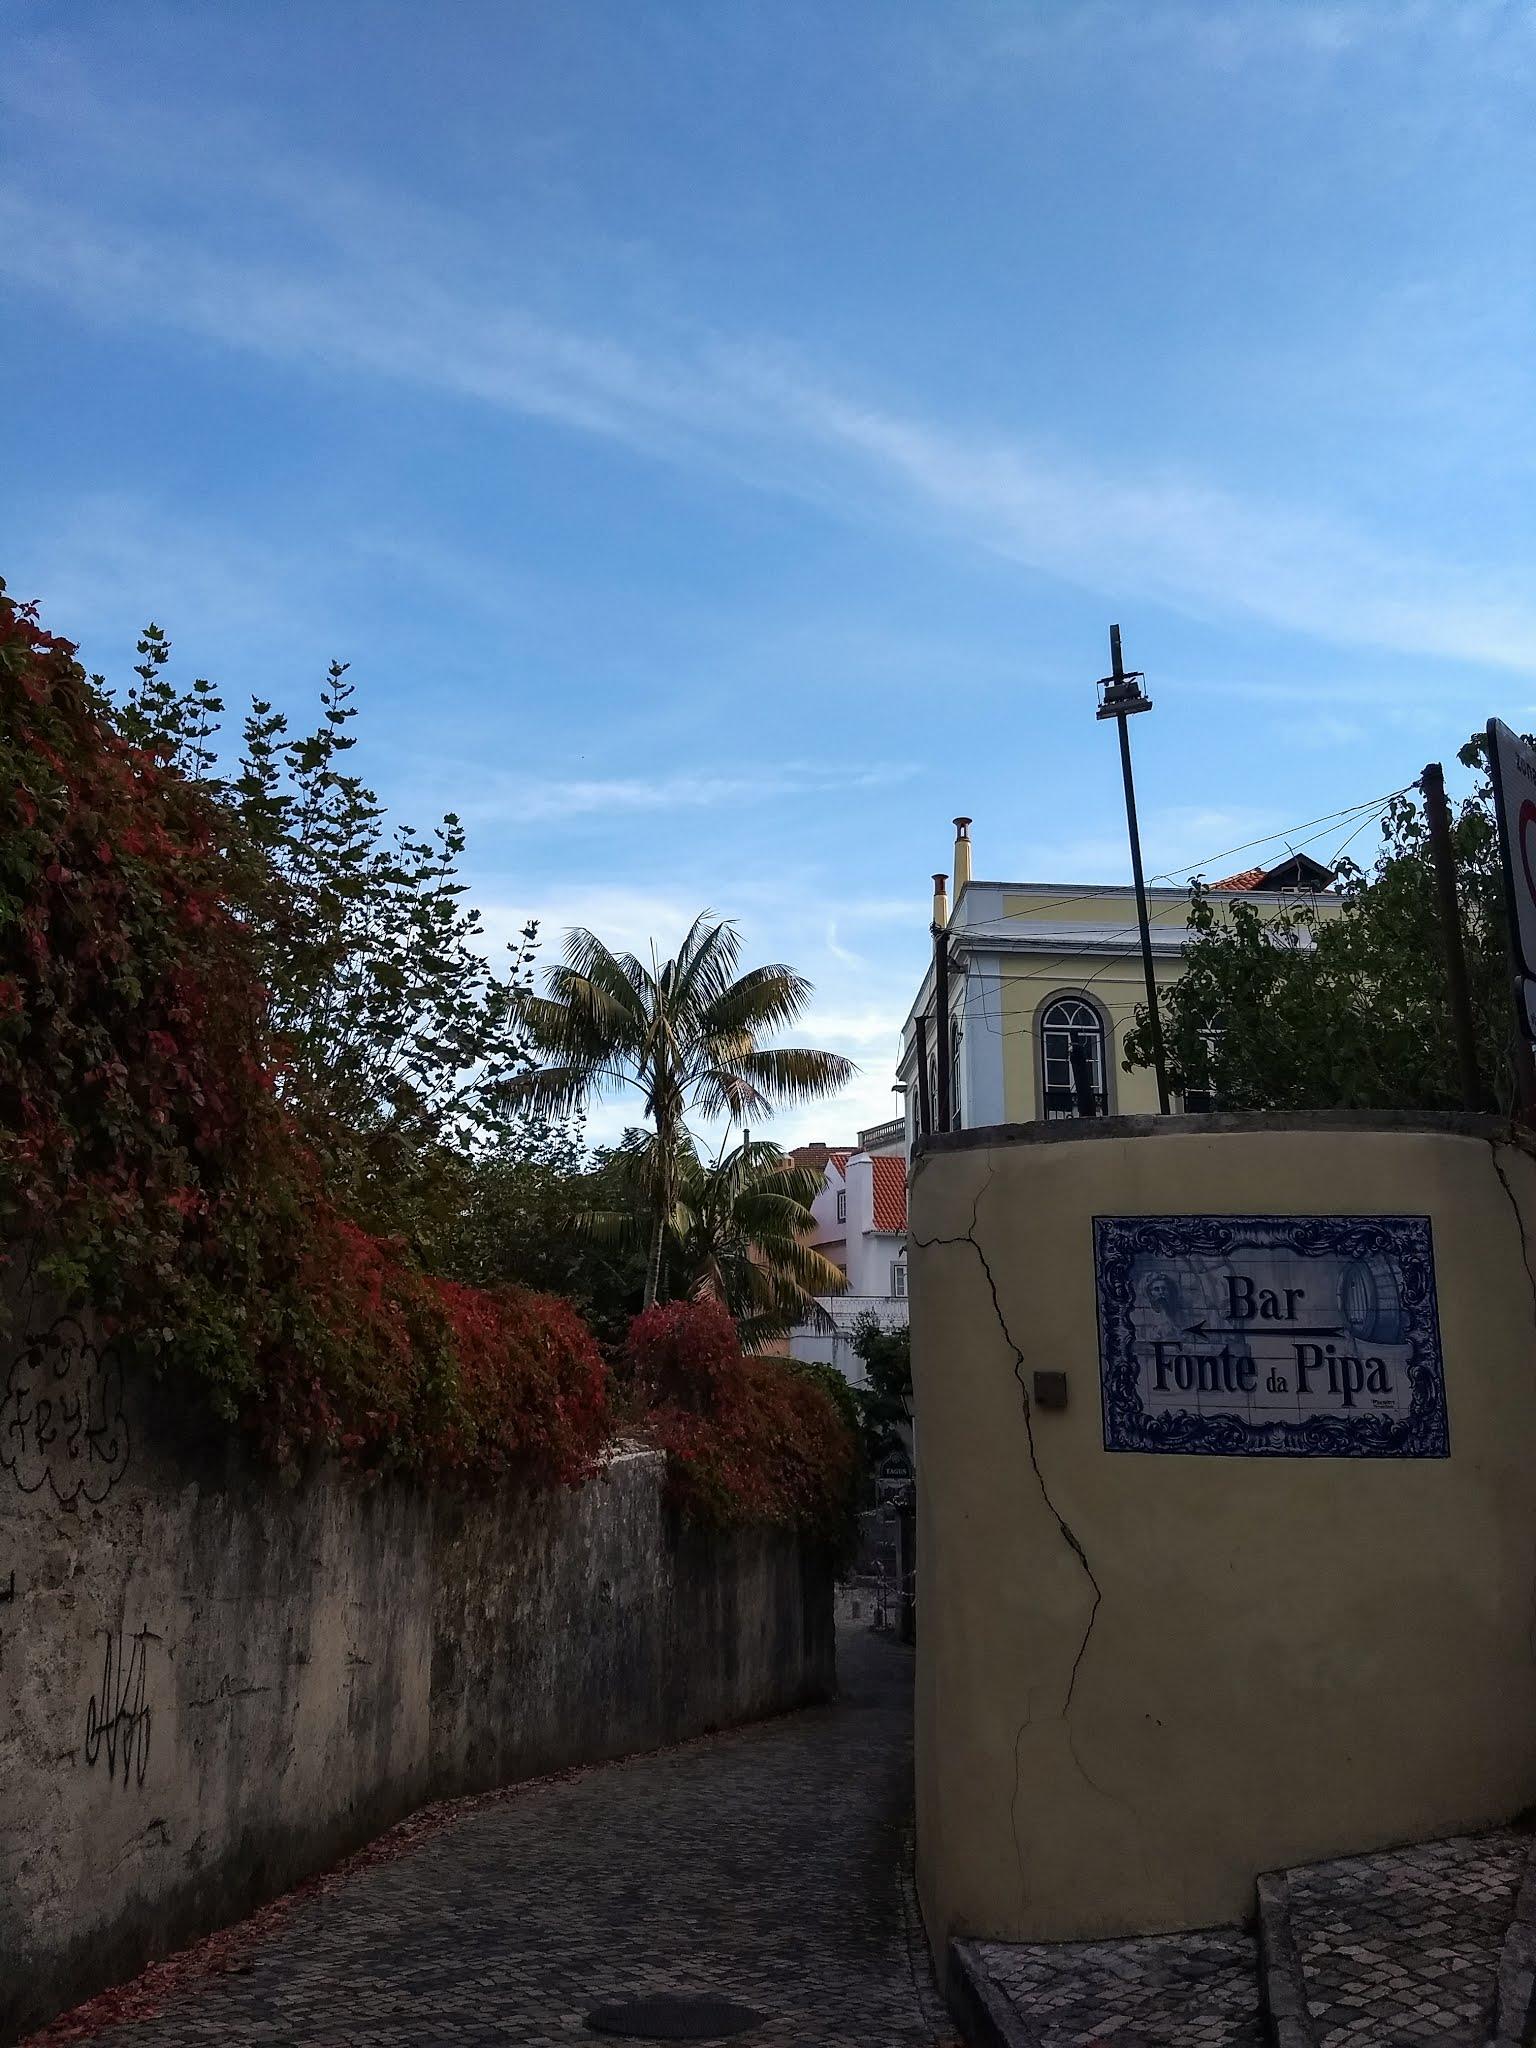 A tiled sign for Bar Fonte de Pipa, Sintra, Portugal.